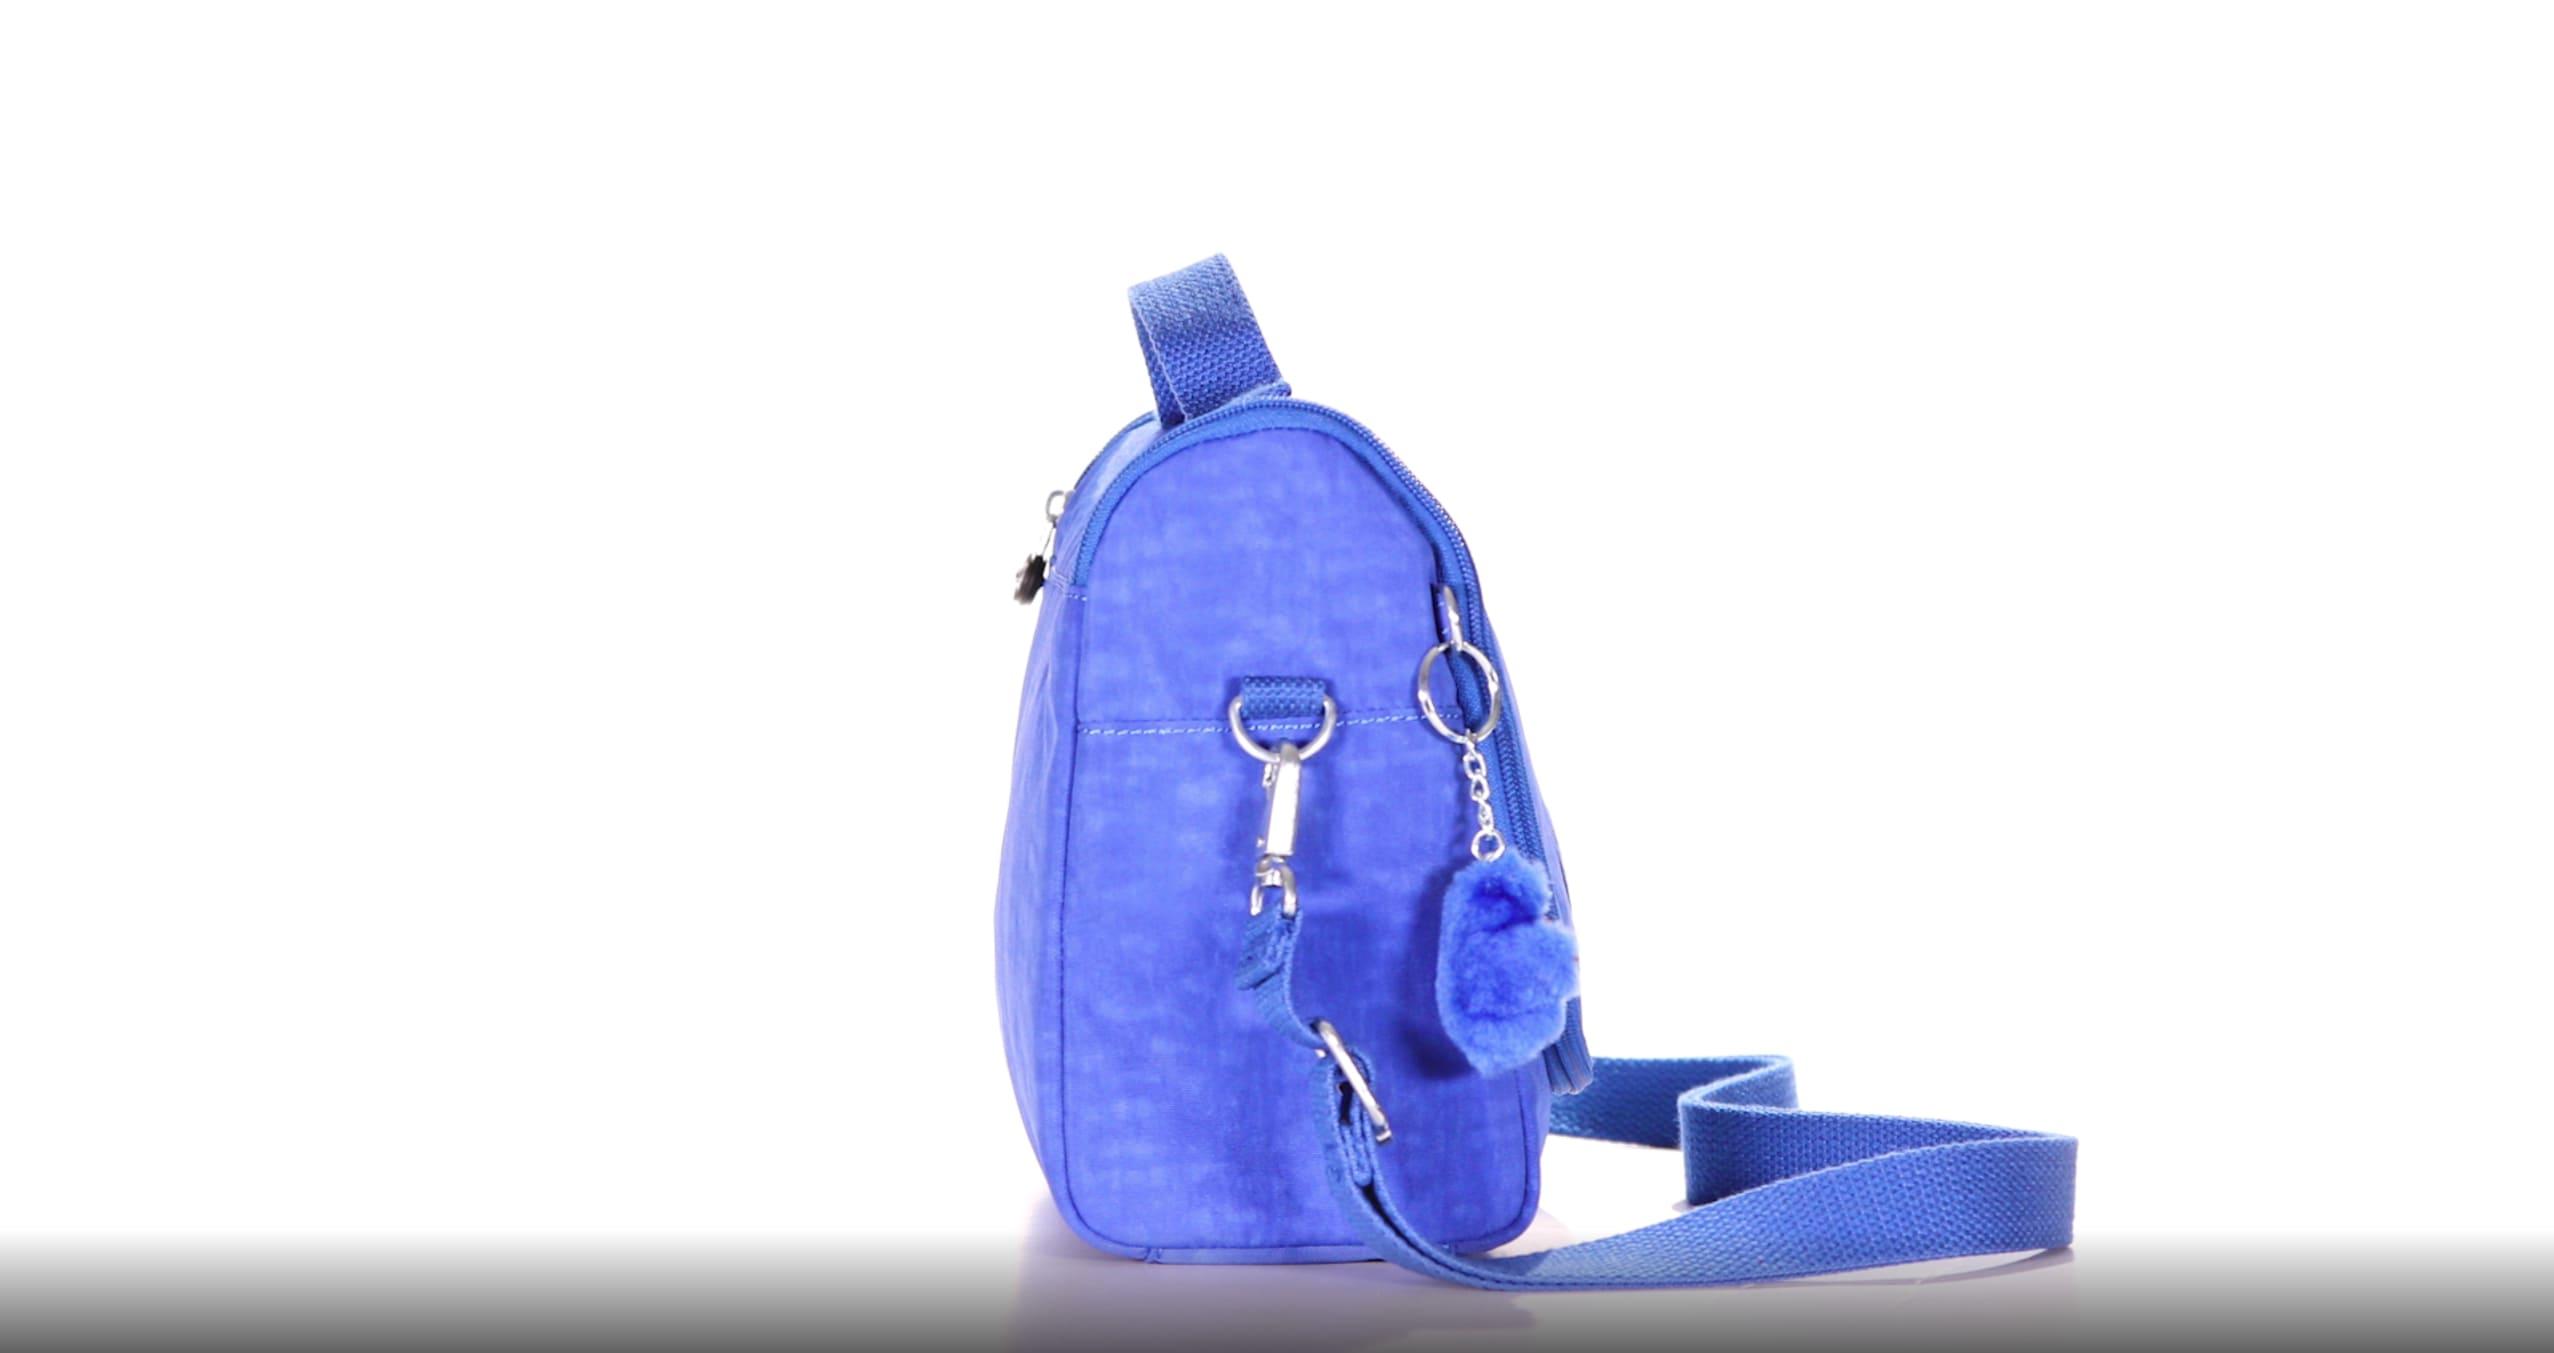 Boys Girls Backpack Rucksack Travel School Work Bag Crazy Smile Blue Black